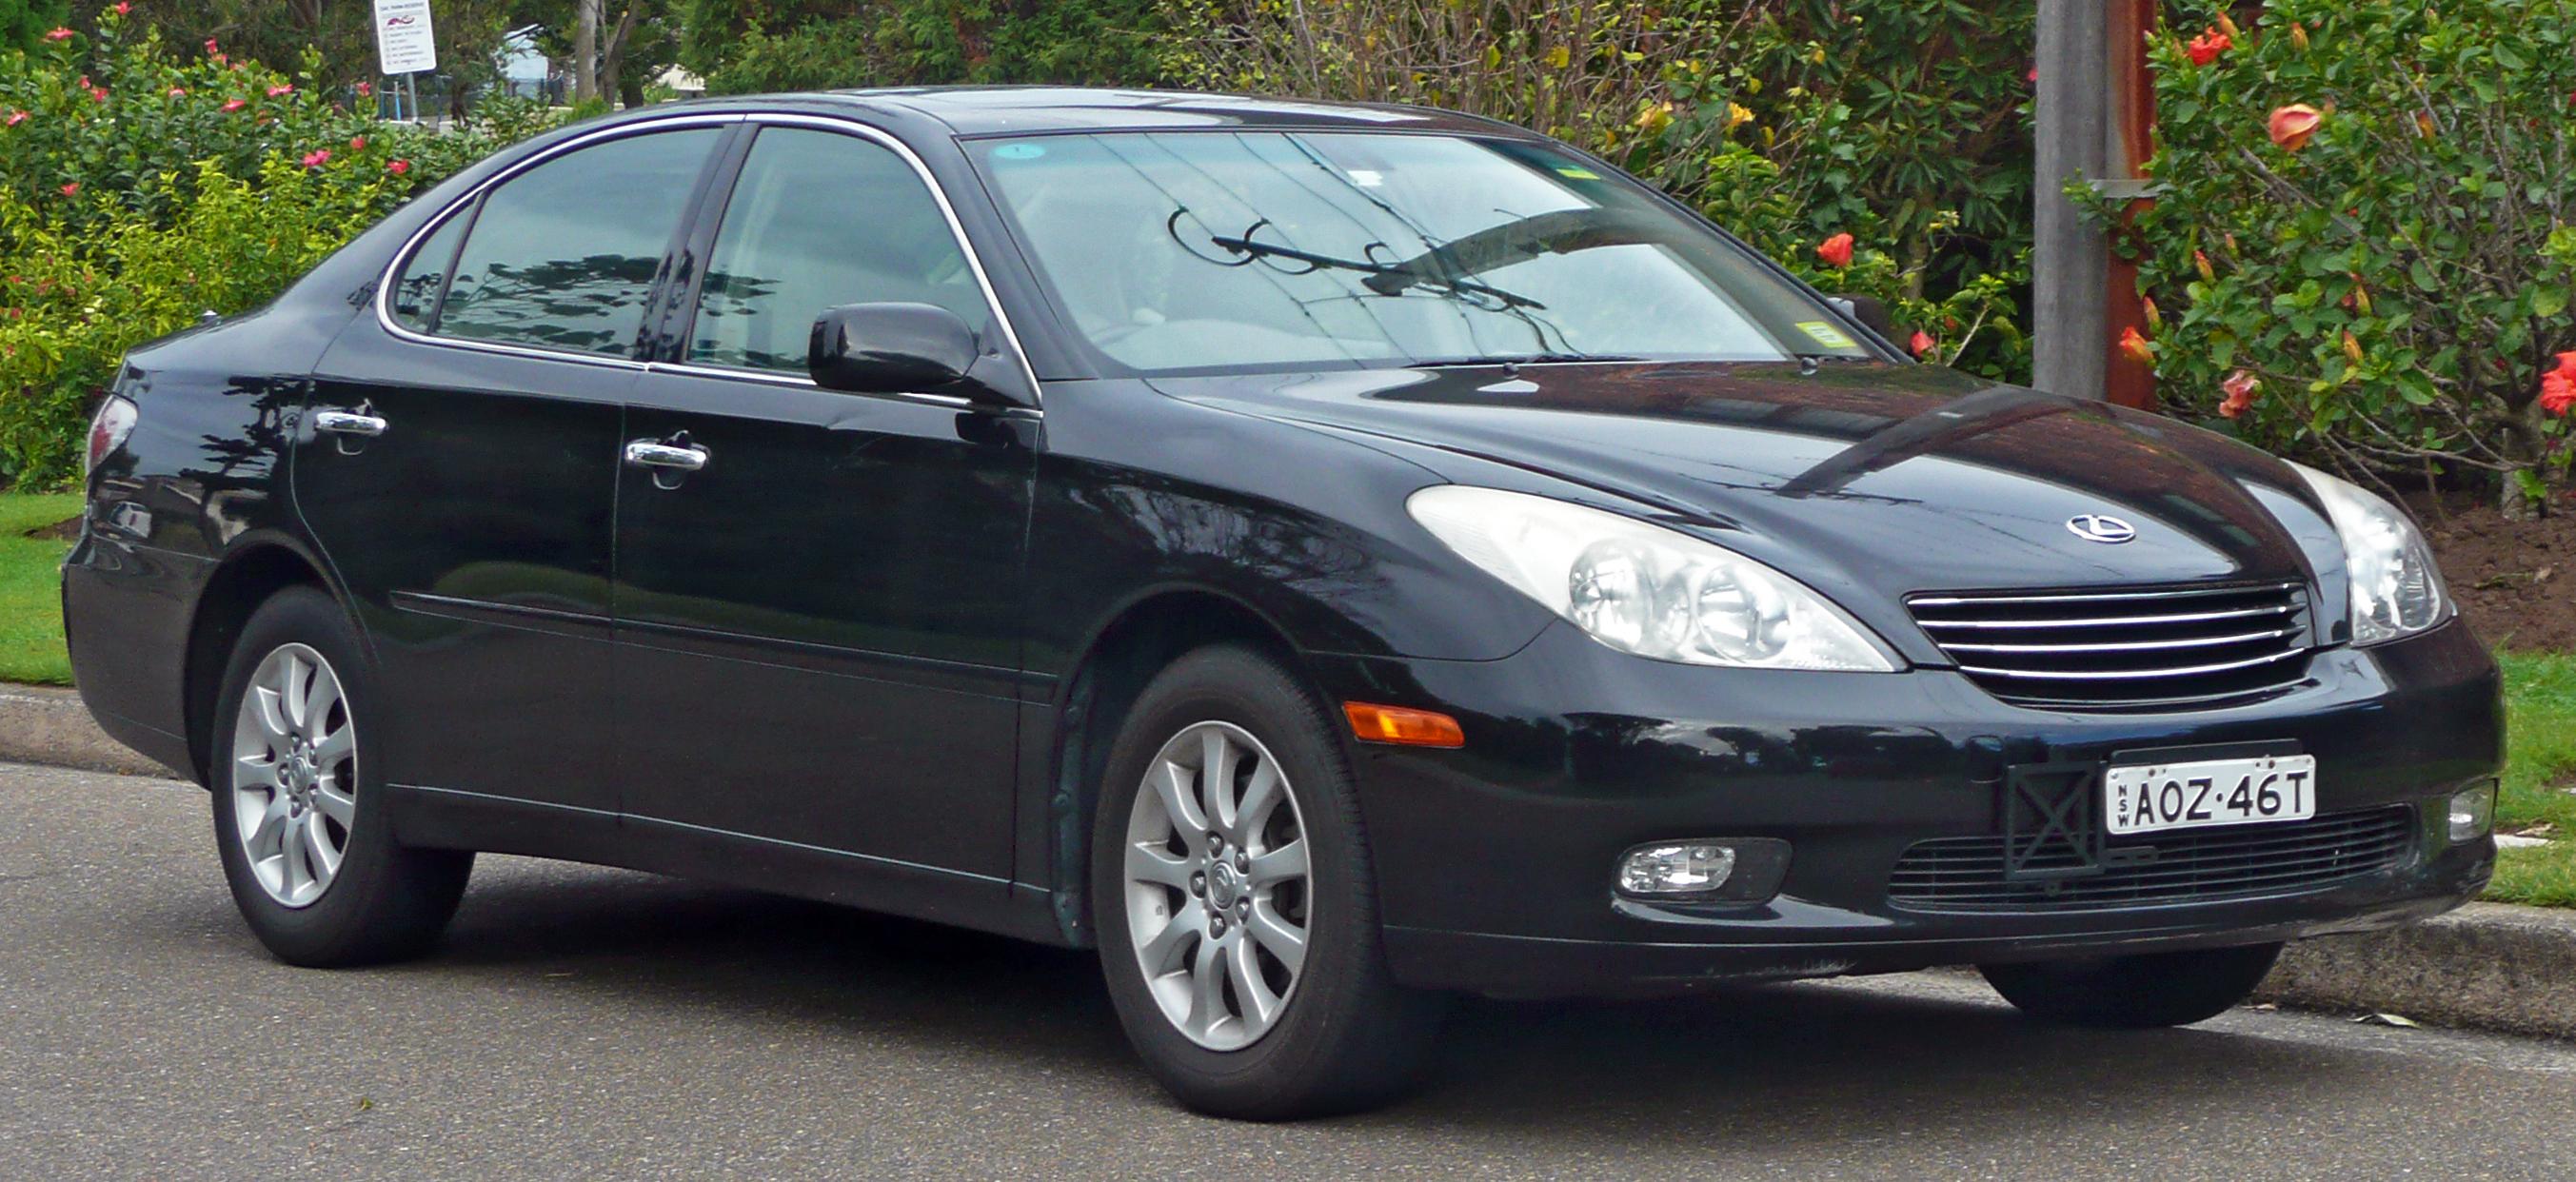 File 2003 Lexus ES 300 MCV30R sedan 2010 06 17 Wikimedia